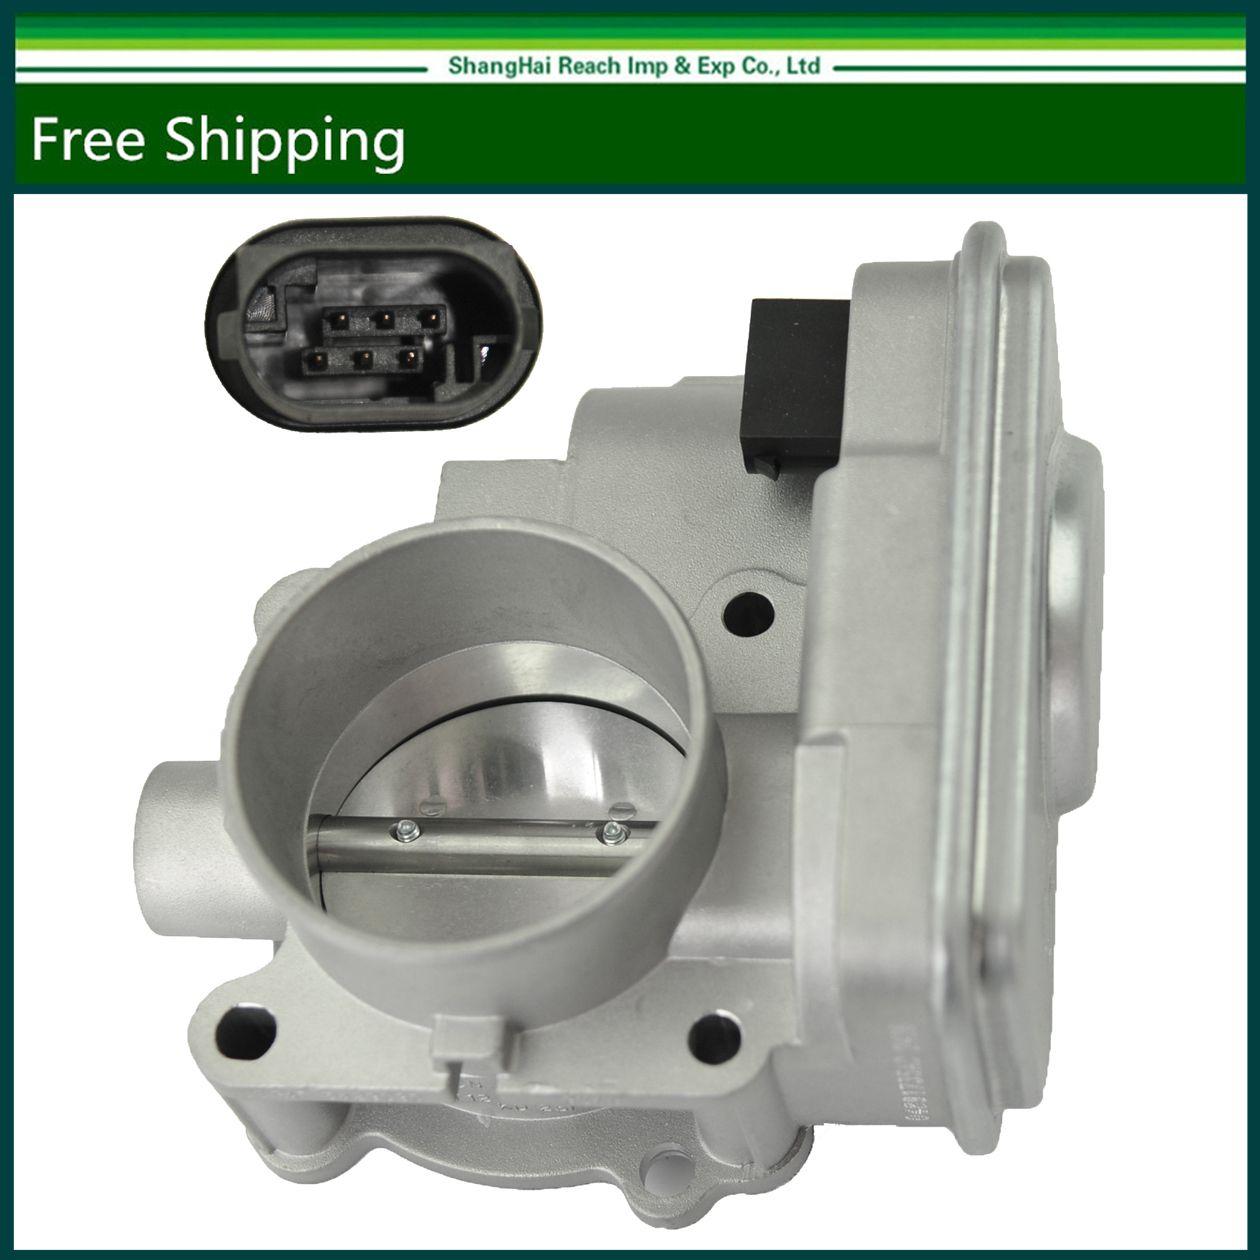 e2c Throttle Body For Dodge Jeep Chrysler 1.8L 2.0L 2.4L Compass Caliber OE#:4891735AC,4891735AB, 4891735AA, 4891735